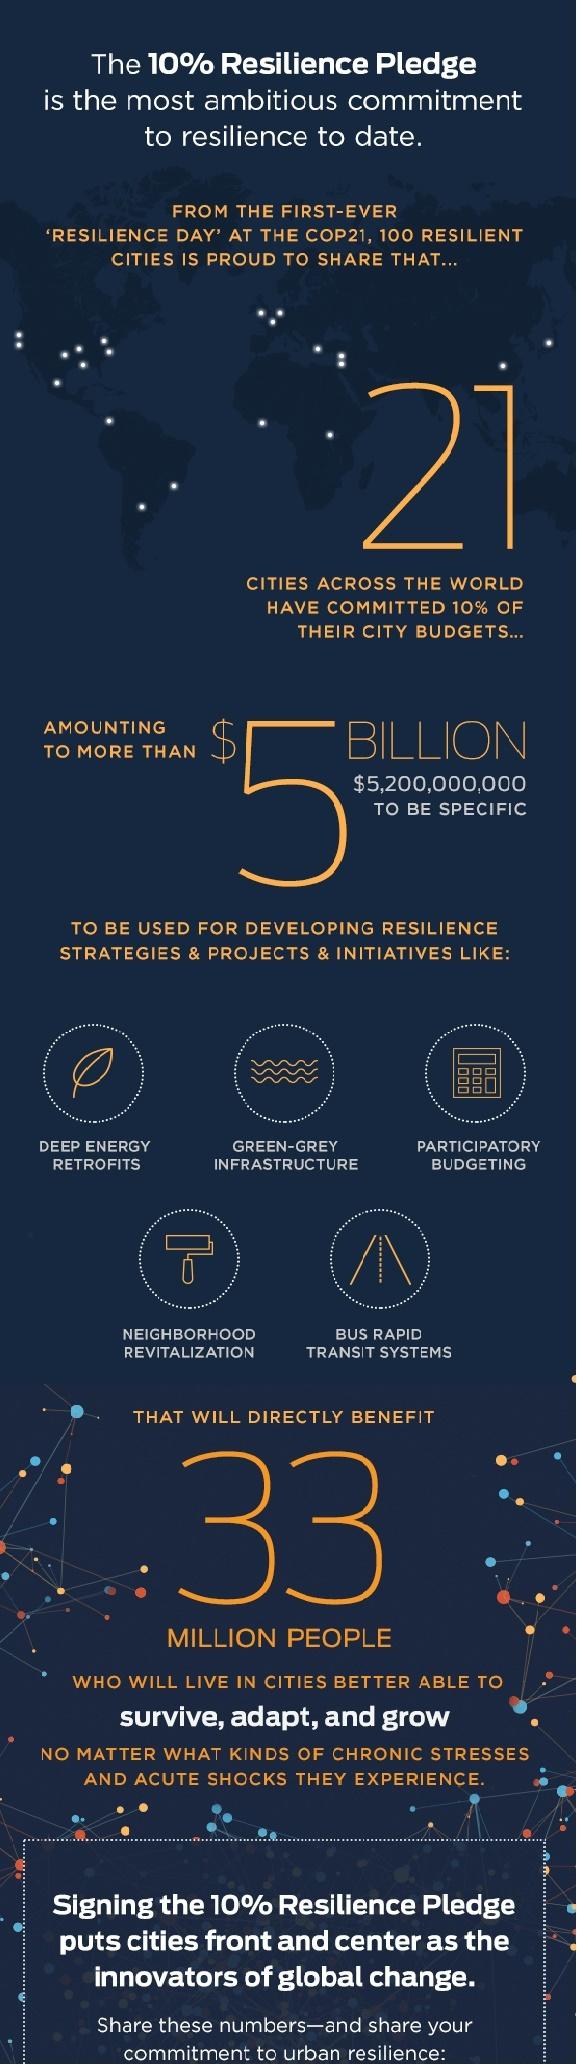 10% City Resilience Pledge